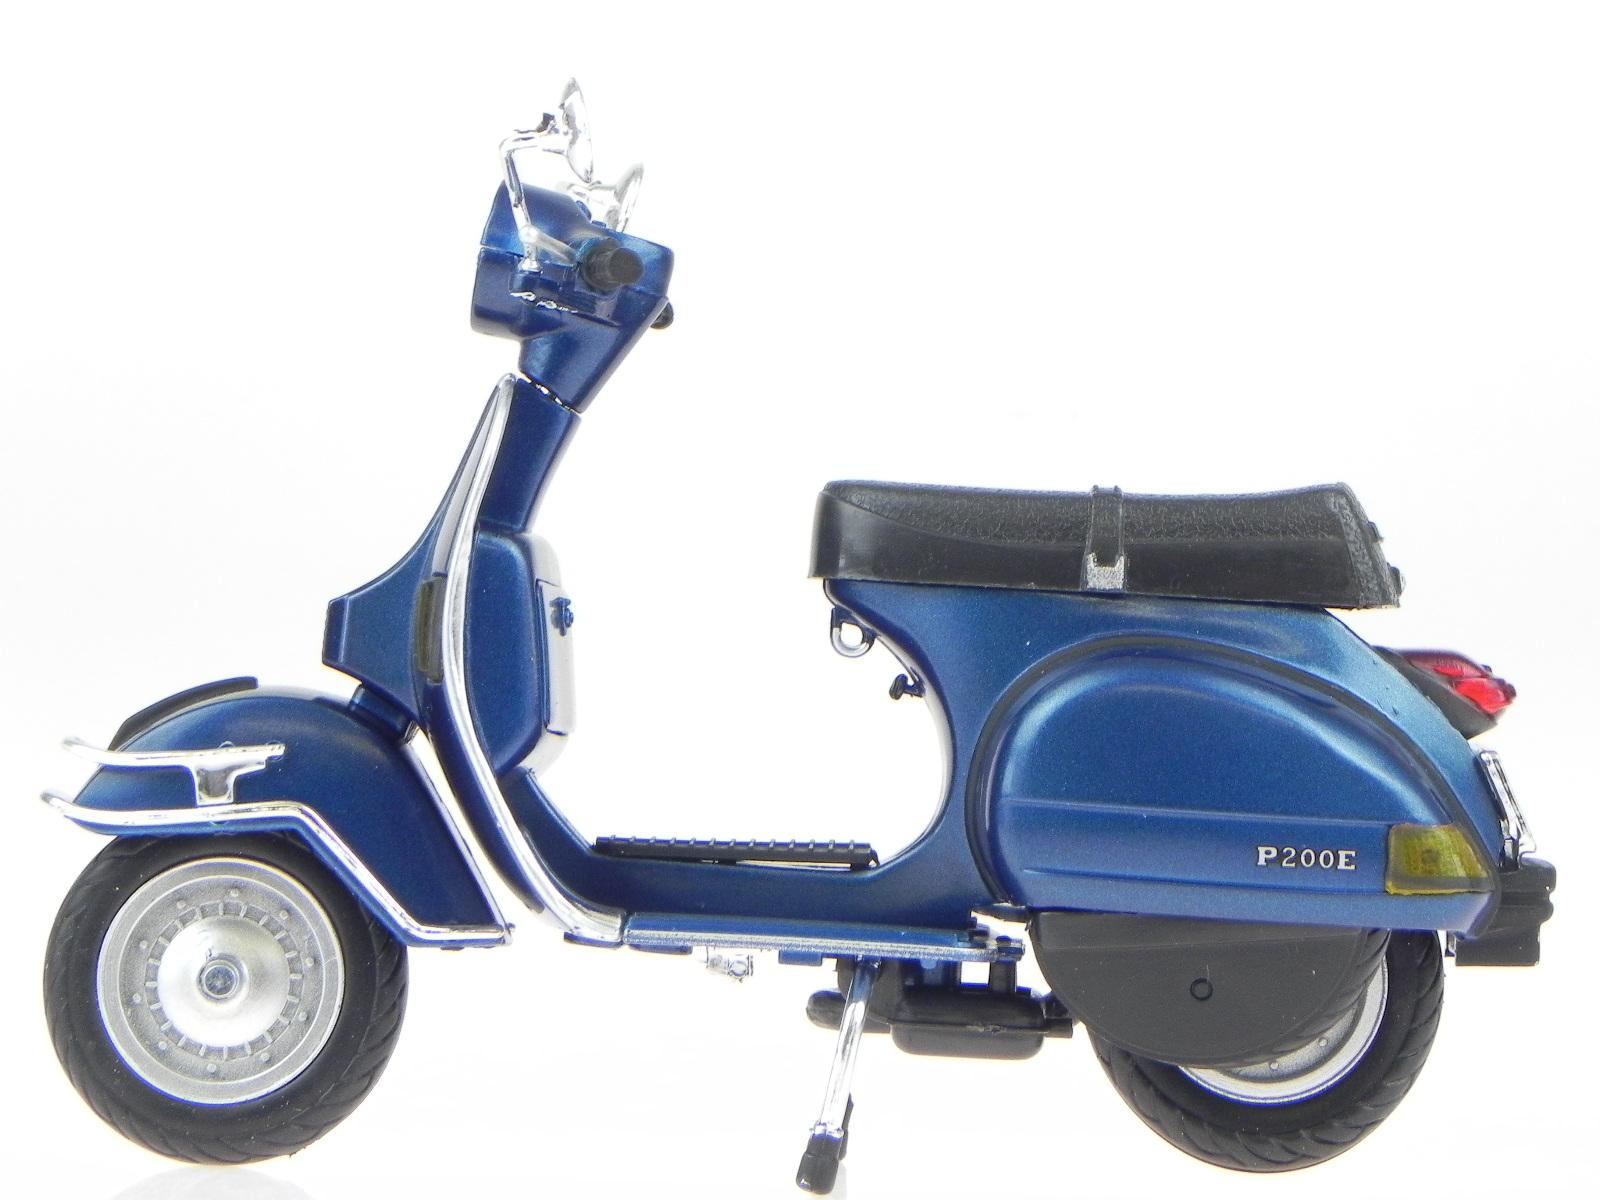 vespa p 200 e px 1978 blue metallic metall modell 42123 newray 1 12 4058124220565 ebay. Black Bedroom Furniture Sets. Home Design Ideas